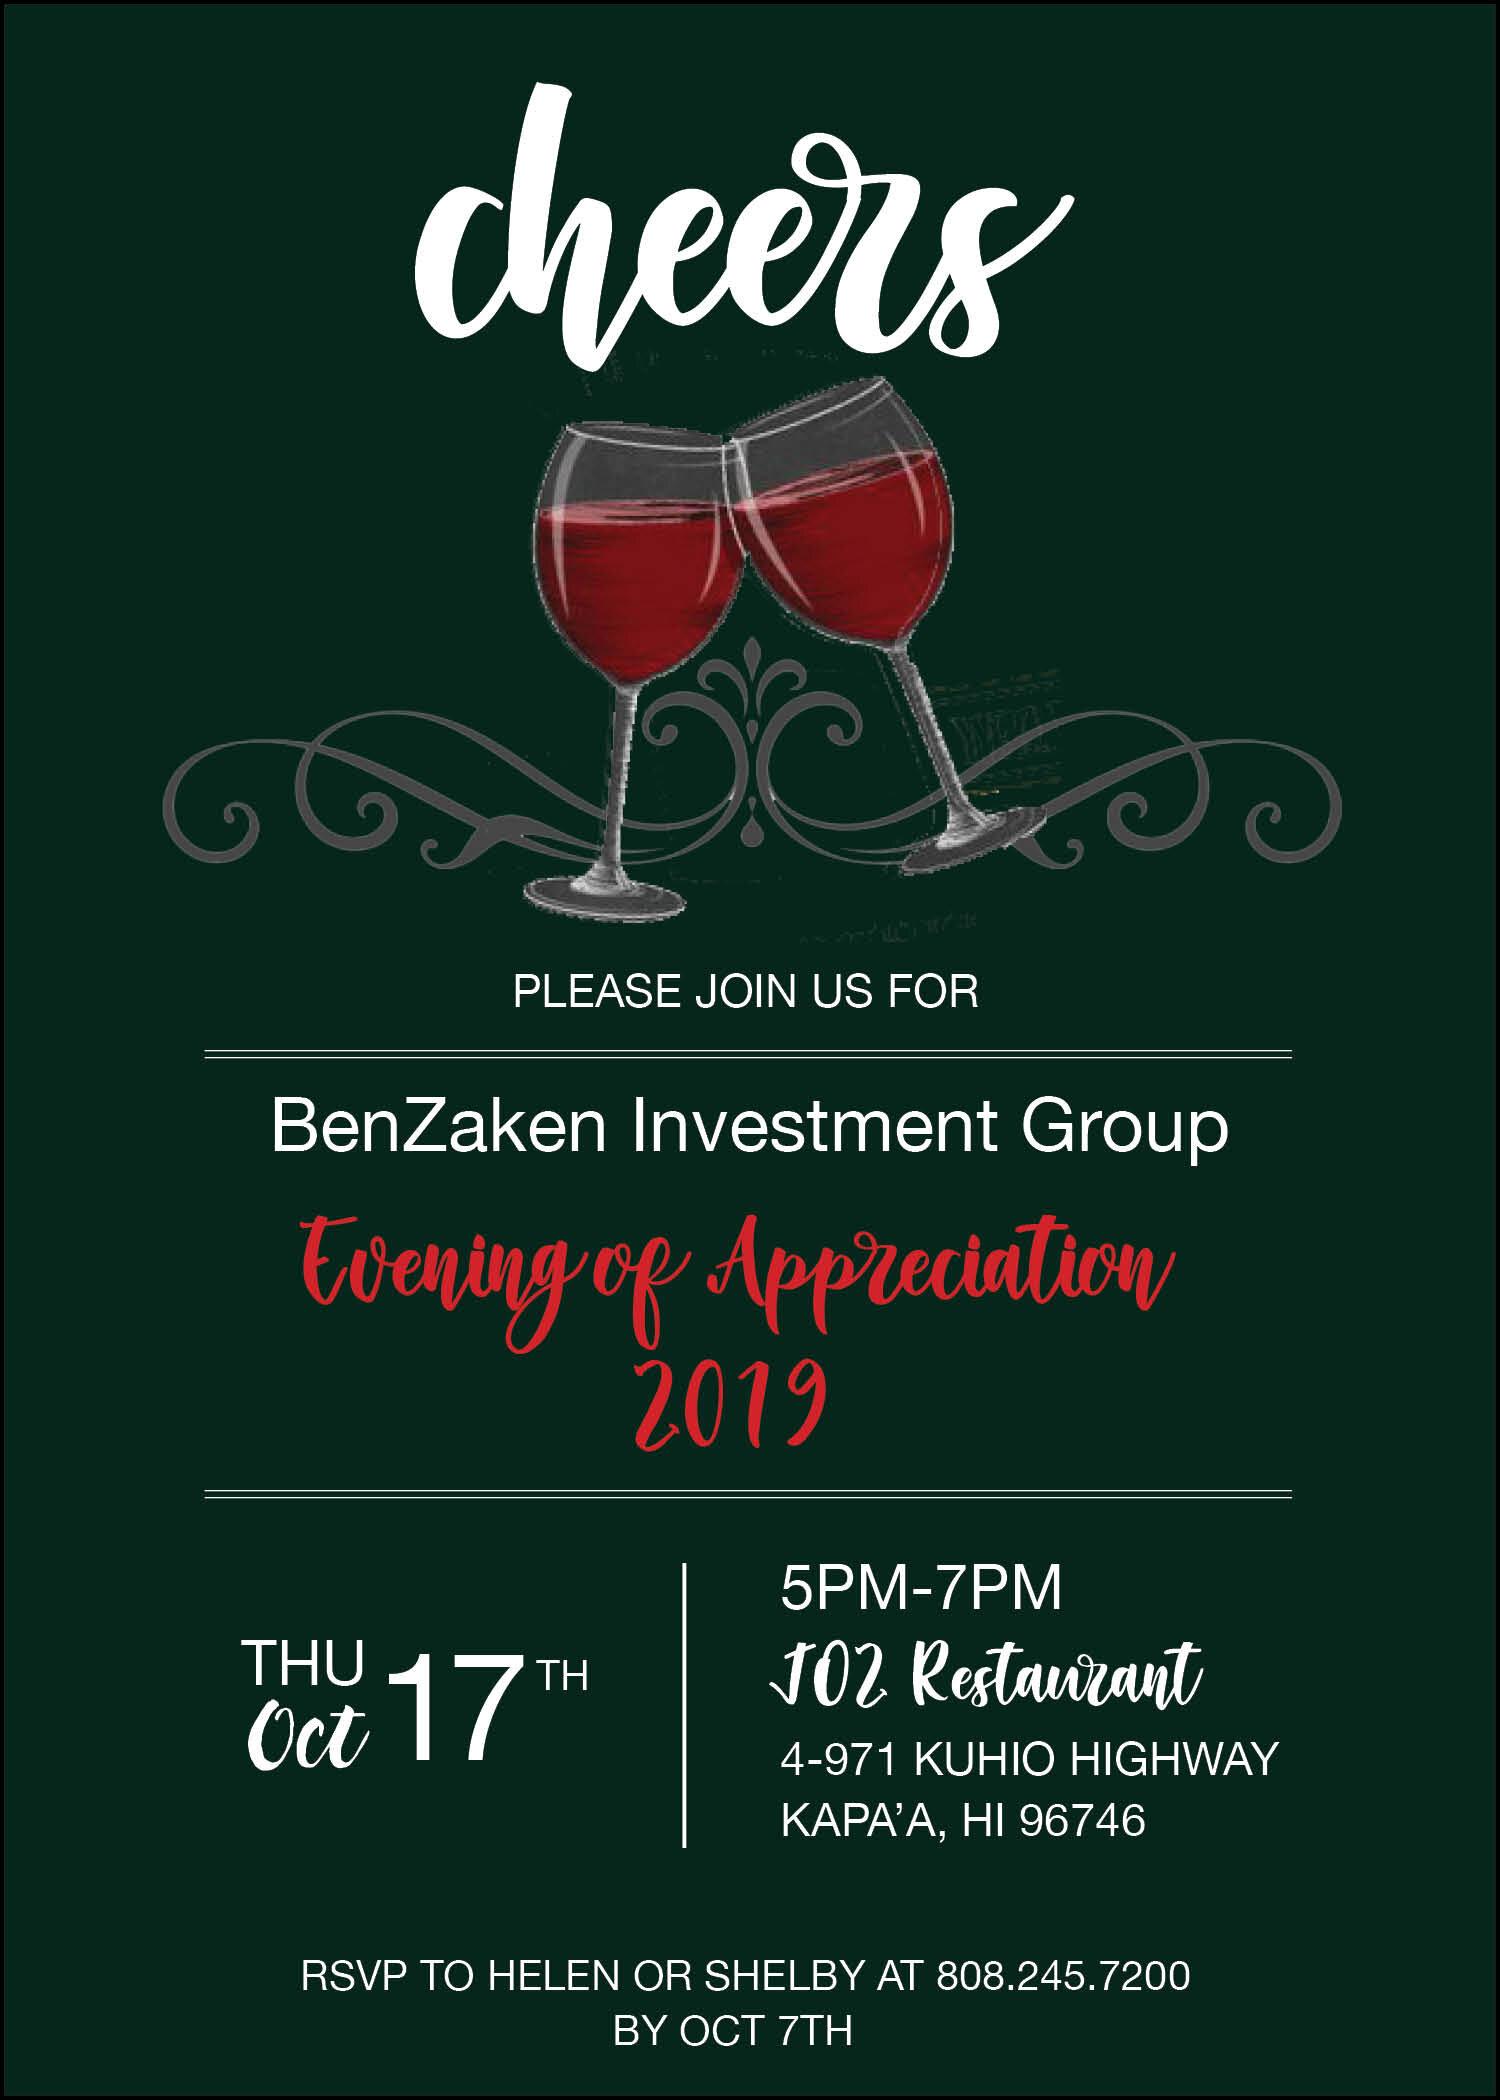 BenZaken_Evening of Appreciation Invite 2019_5x7_FRONT.jpg